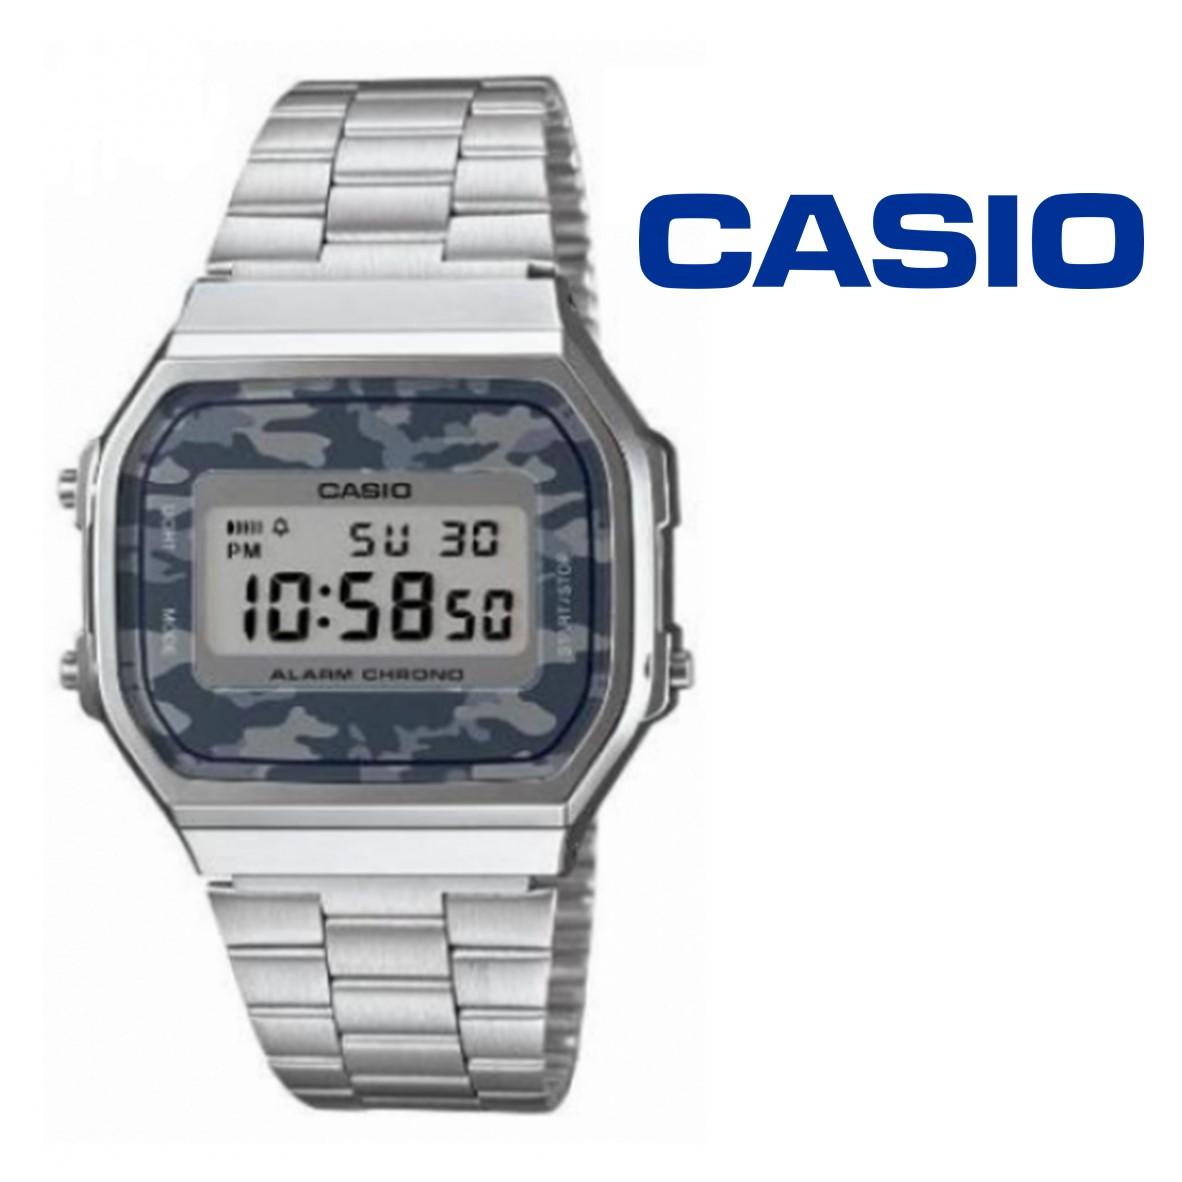 Vintage Casio® Reloj Gis Plata Camuflado A168we YEH29eIbWD